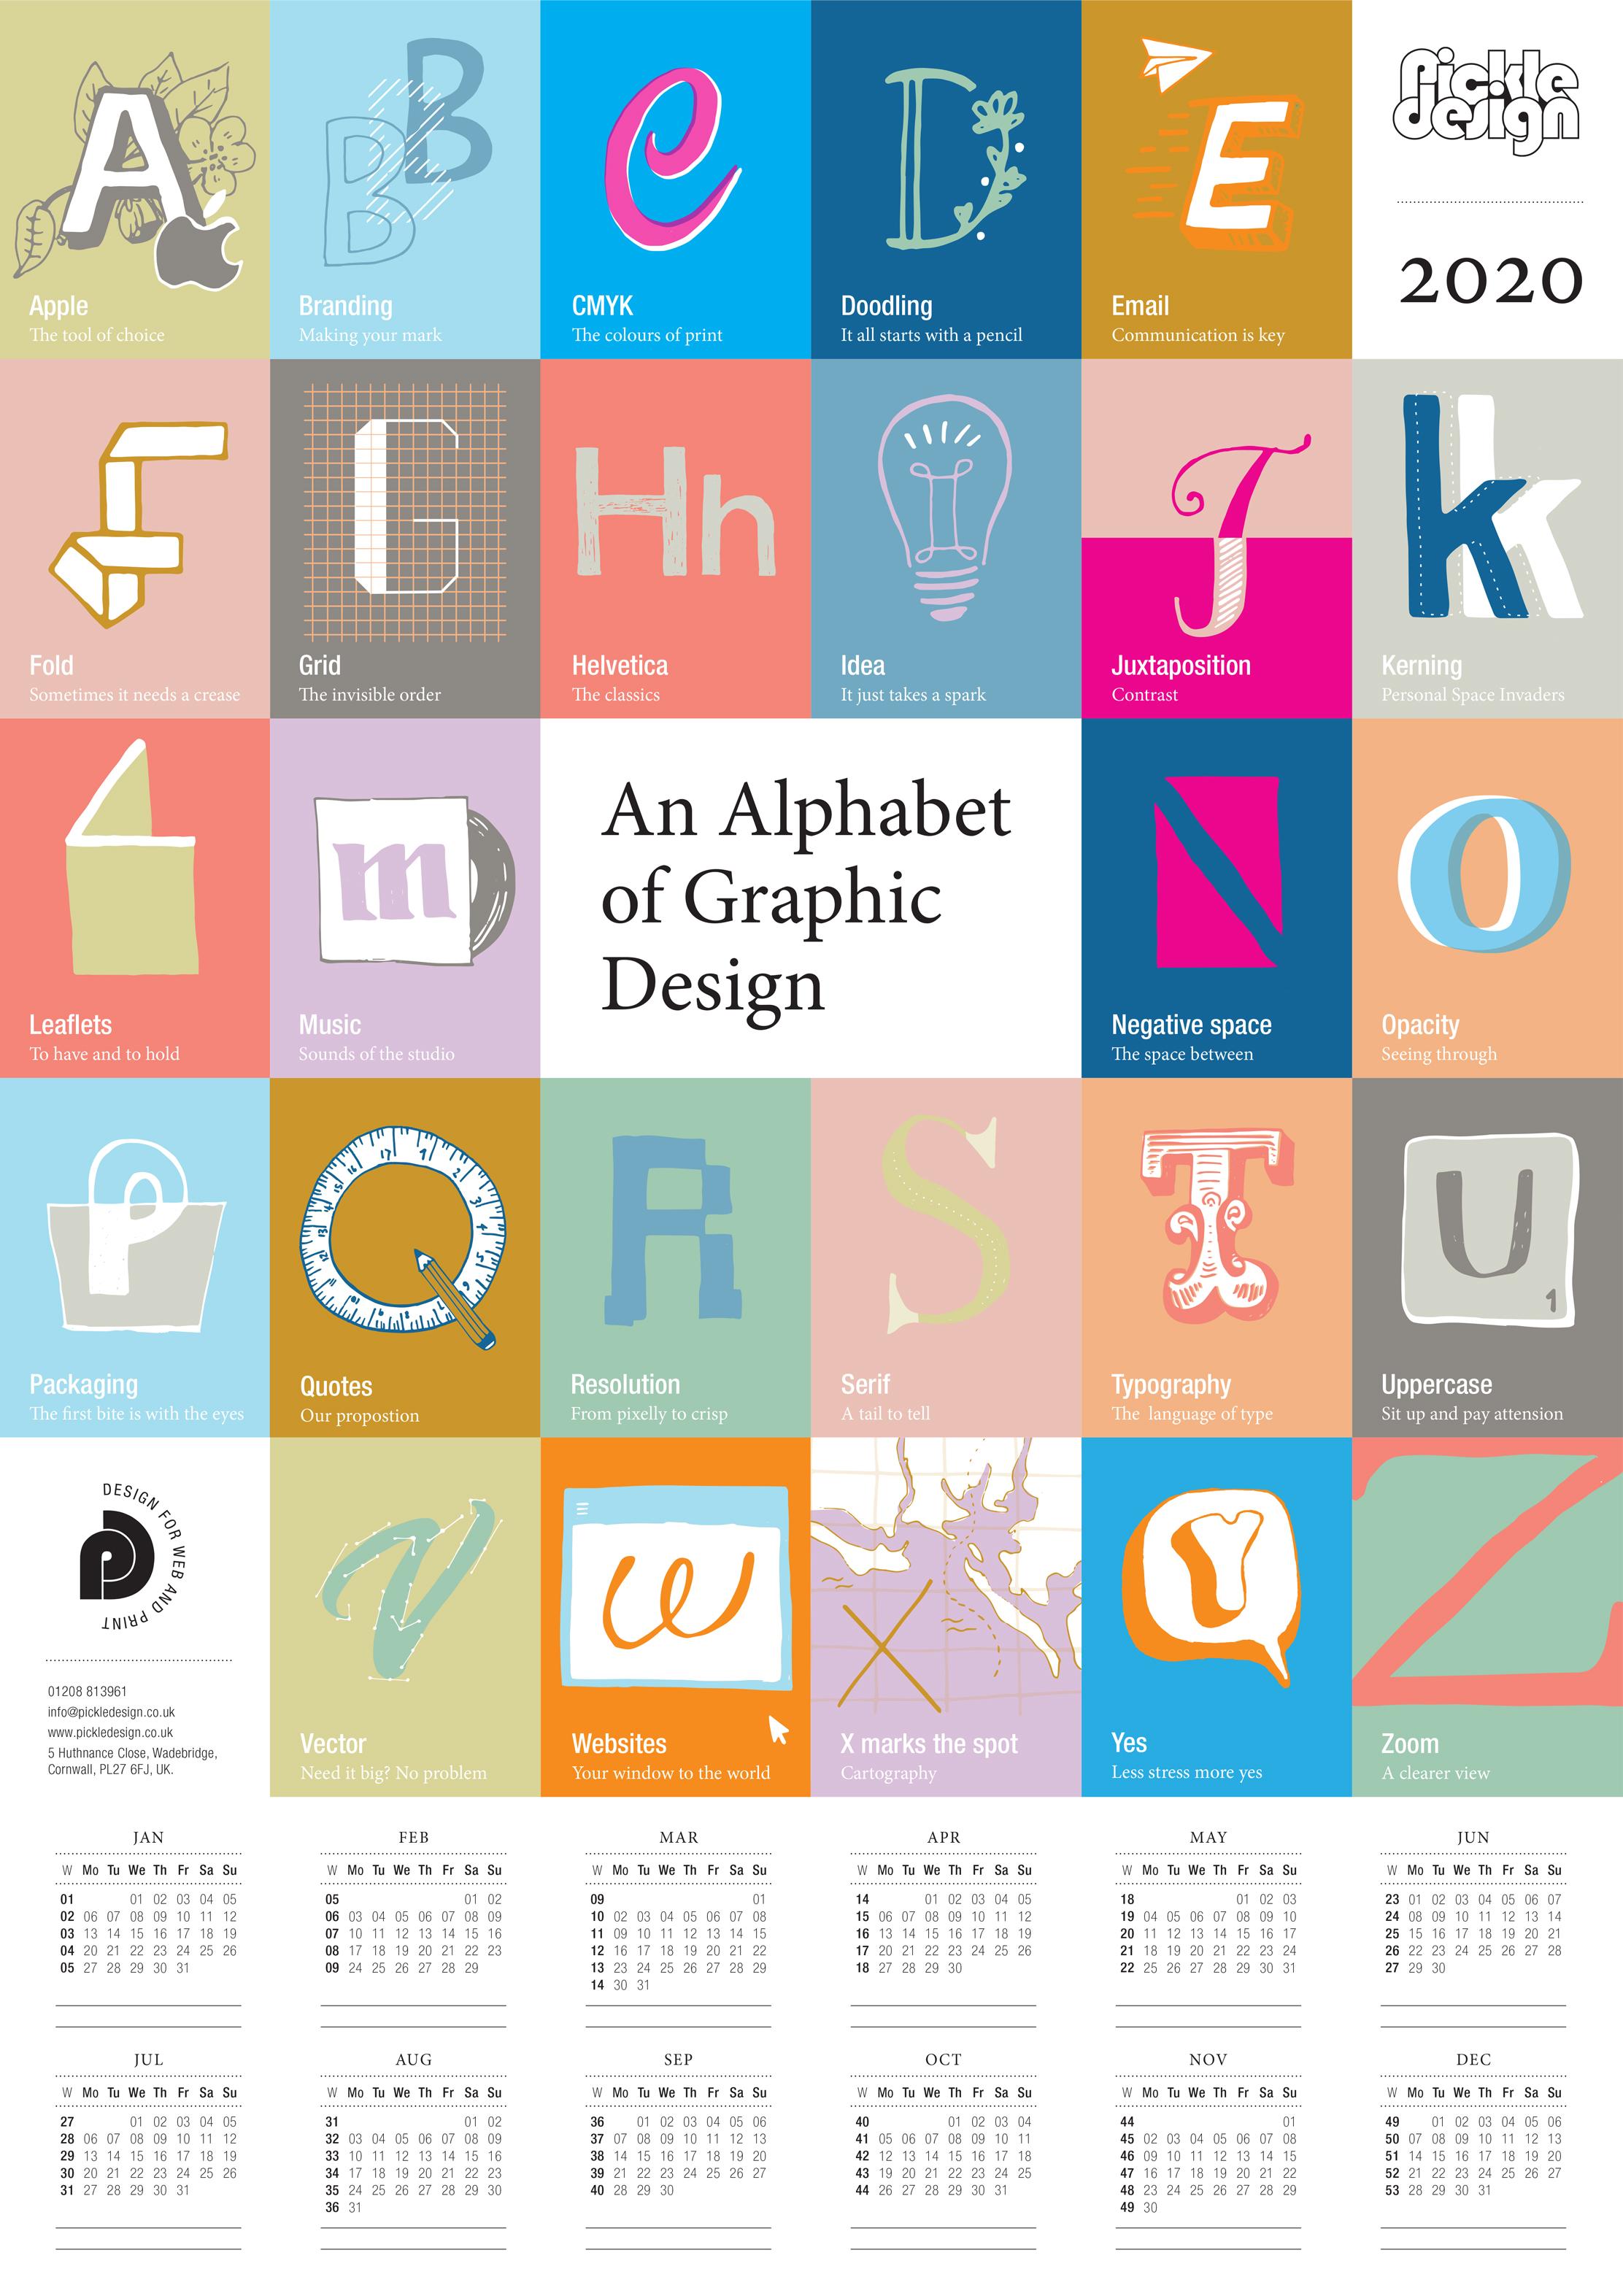 An Alphabet of Graphic Design poster